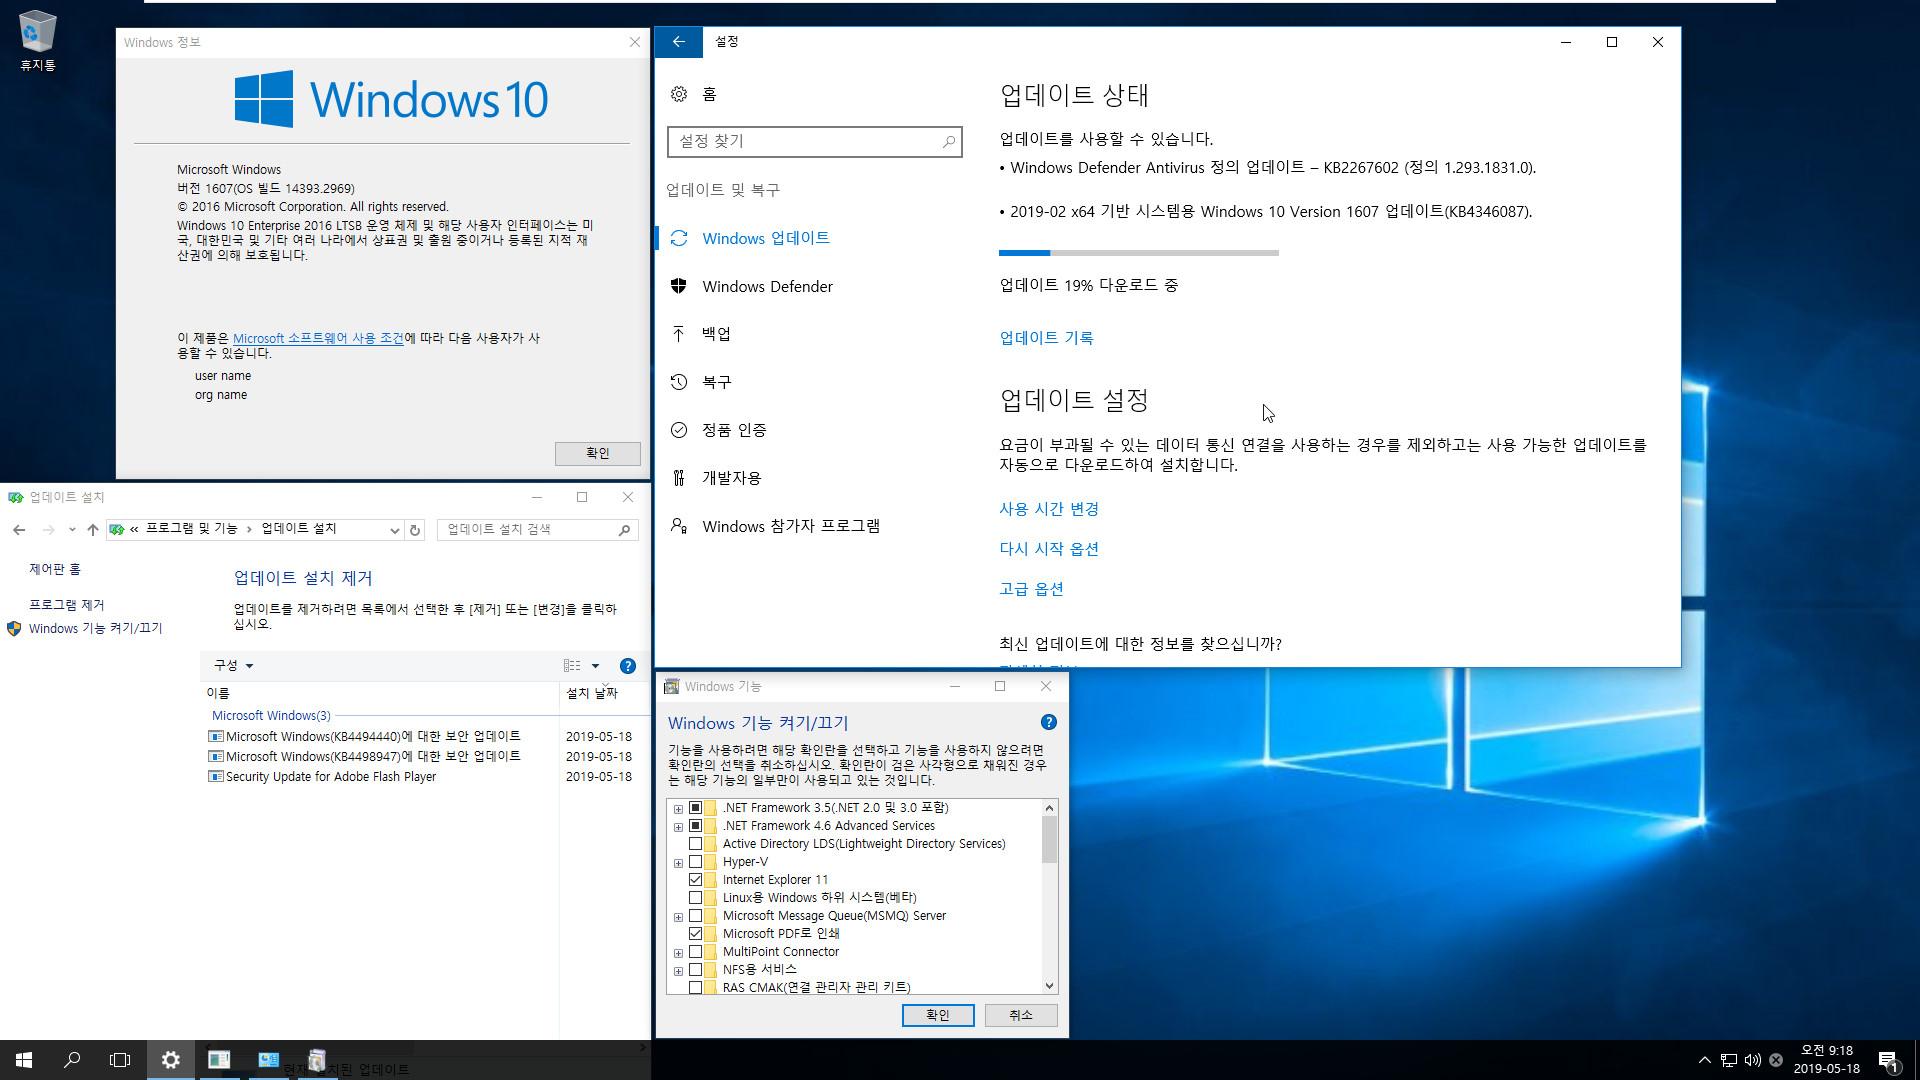 Windows 10 버전 1607용 누적 업데이트 KB4494440 (OS 빌드 14393.2969) [2019-05-14 일자] - 2016 LTSB만 통합중입니다 2019-05-18_091845.jpg